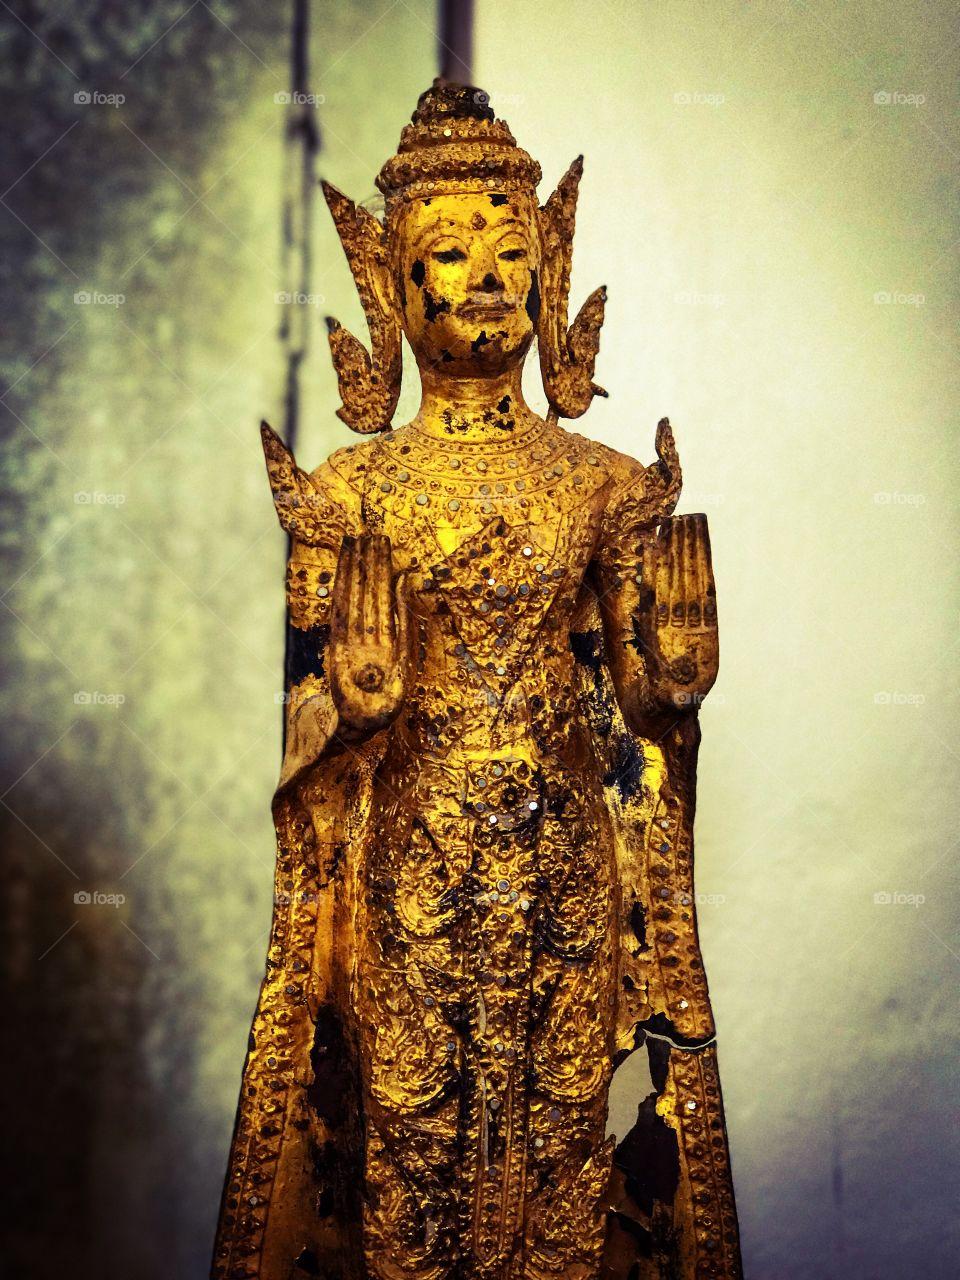 Ancient Buddha image displayed in Chaiya National Museum, Surat Thani, southern Thailand